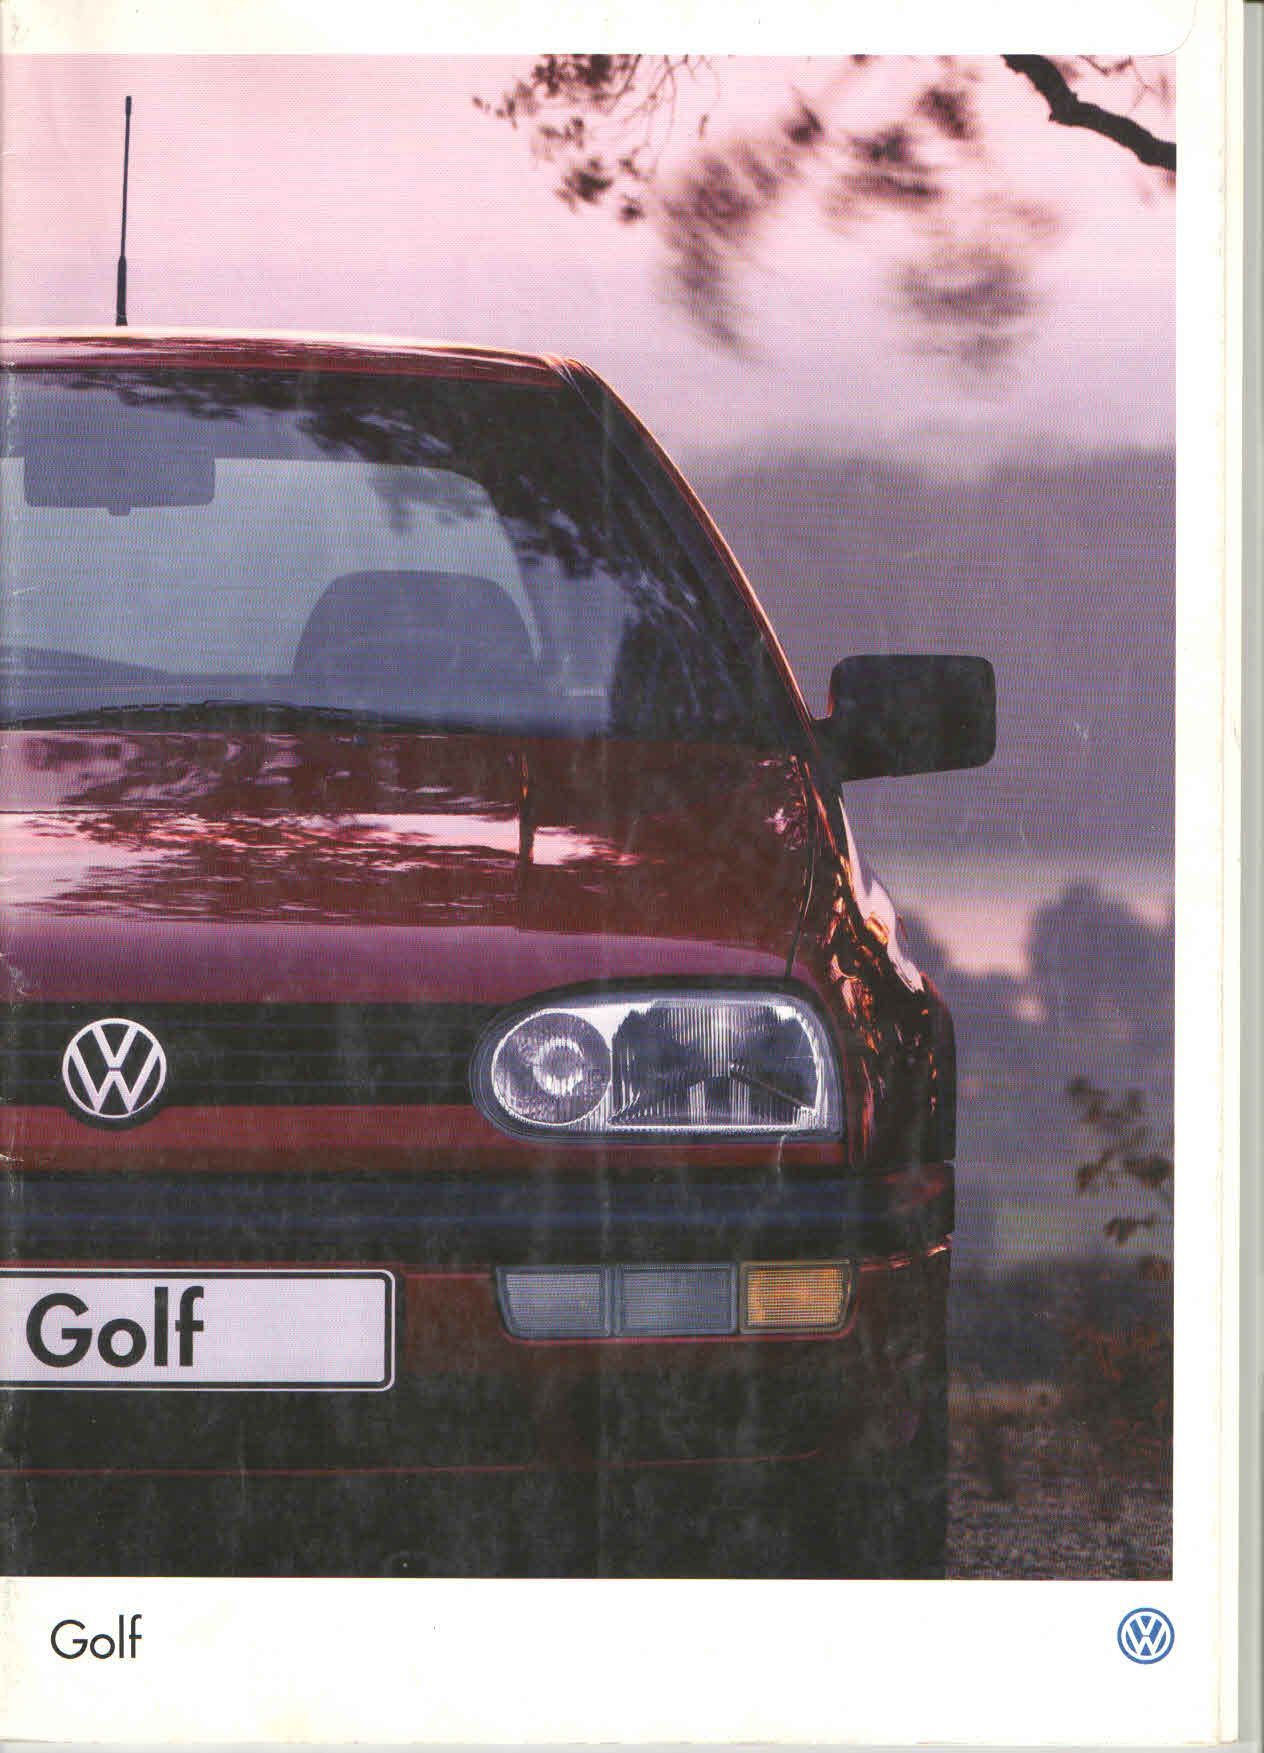 1996 Volkswagen Golf Mk3 Turkish Brochure Catalog Page 1 40